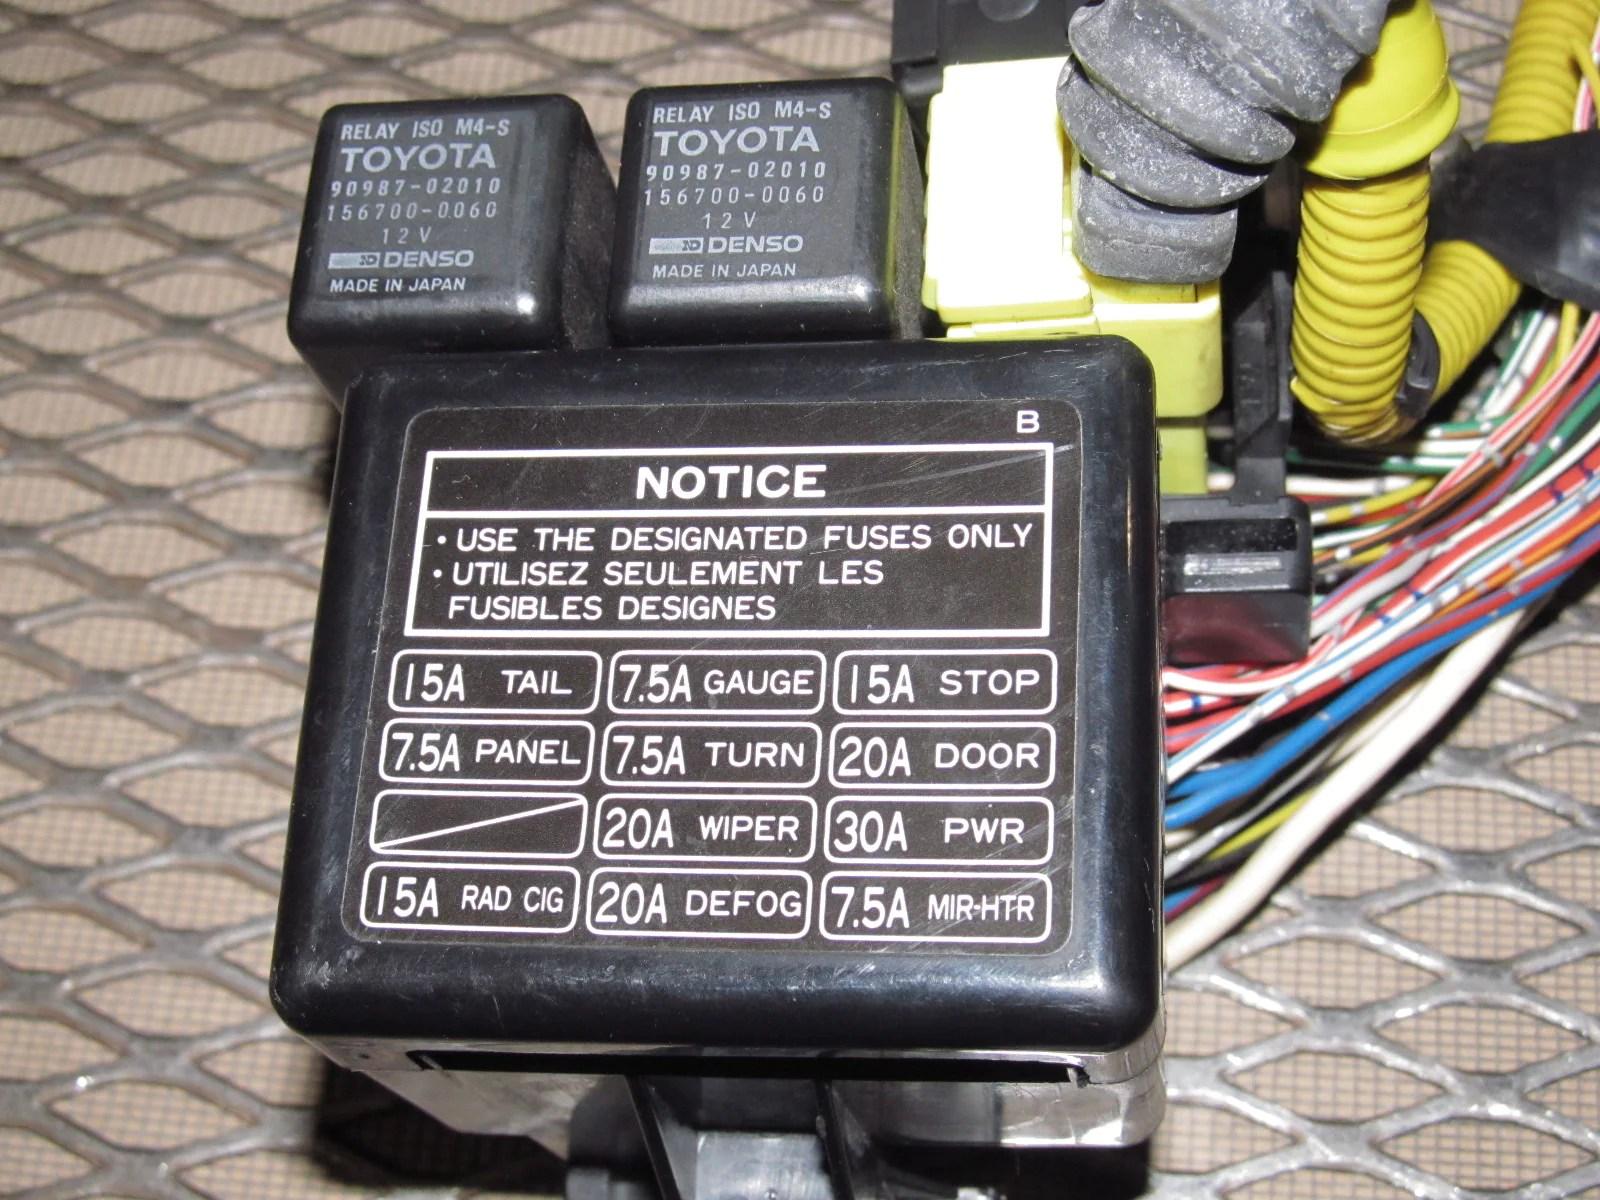 91 92 93 94 nissan 240sx oem interior fuse box cover autopartone [ 1600 x 1200 Pixel ]